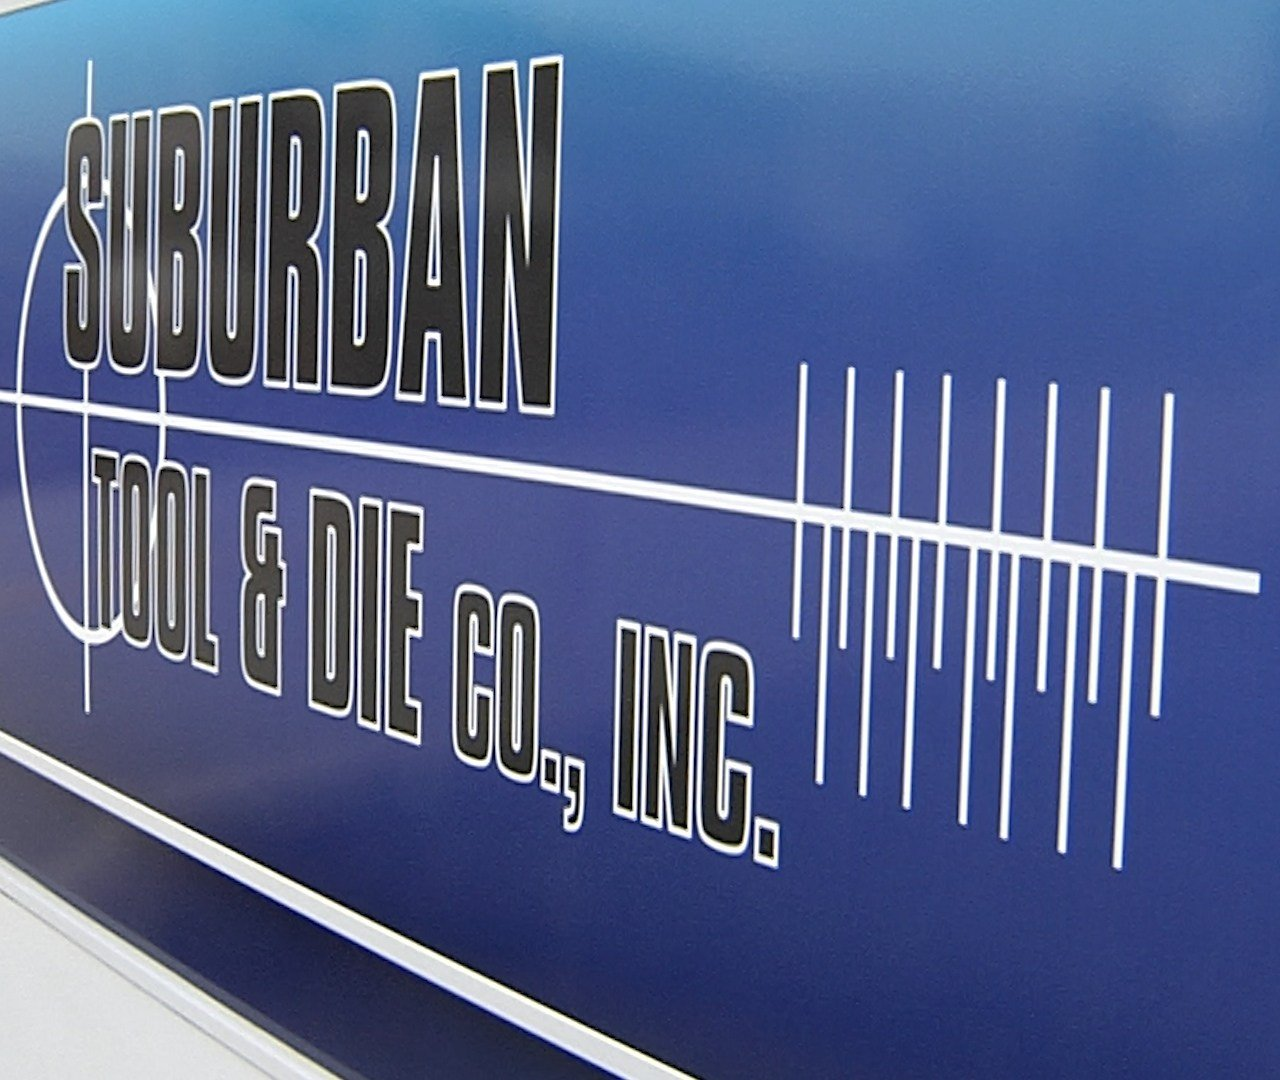 Suburban Tool & Die